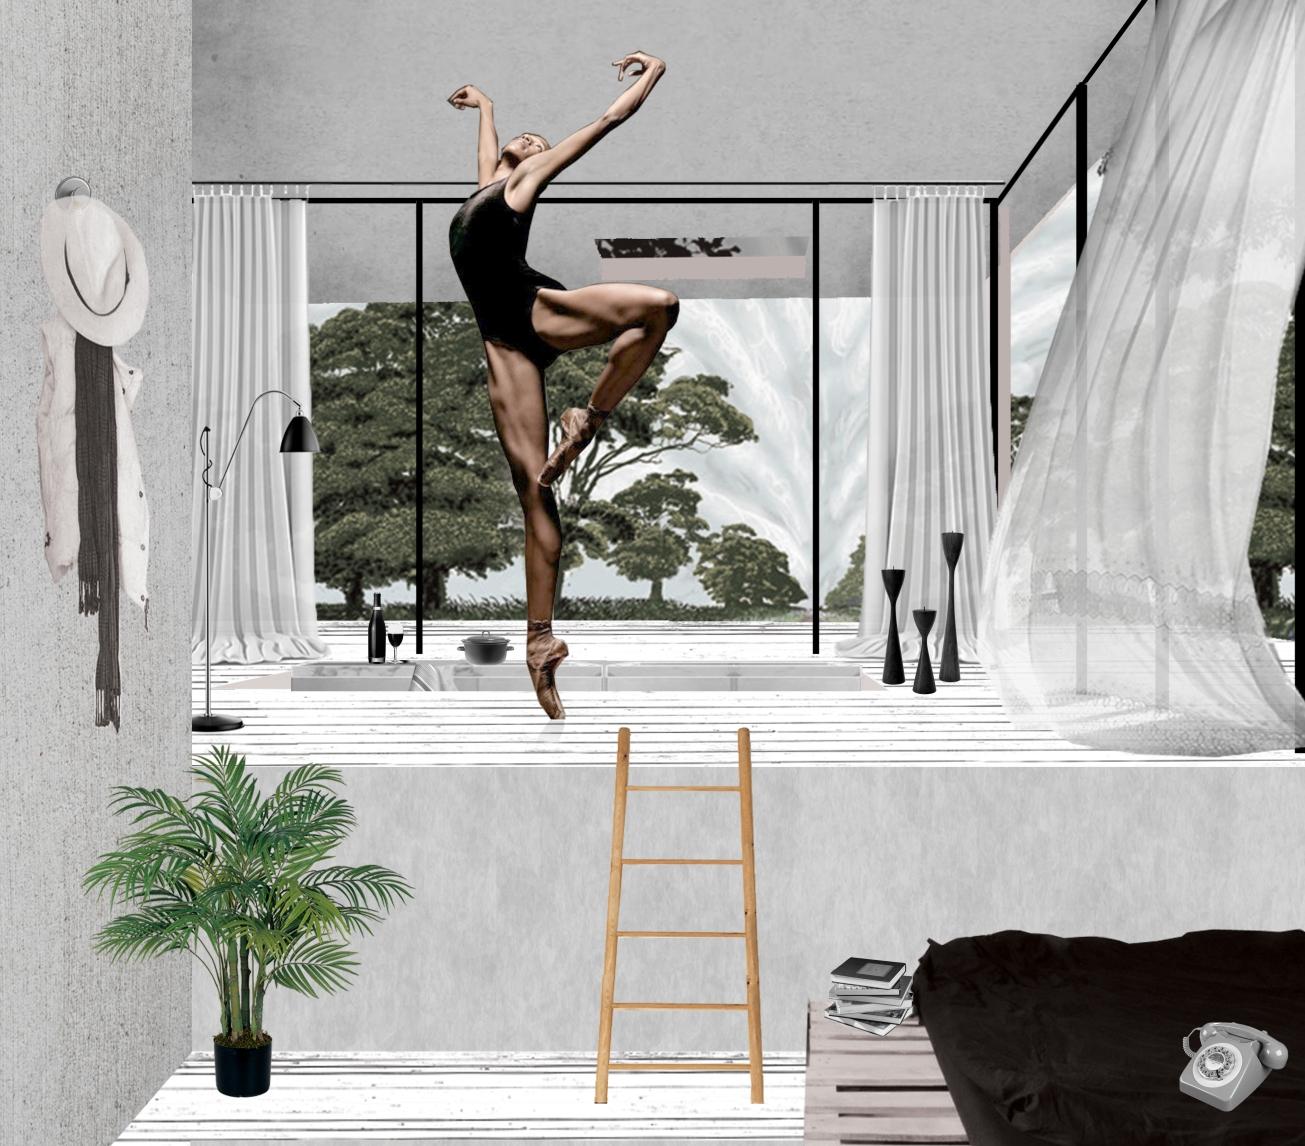 5-platform-room_bakavou-vasiliki_master-thesis-u-th